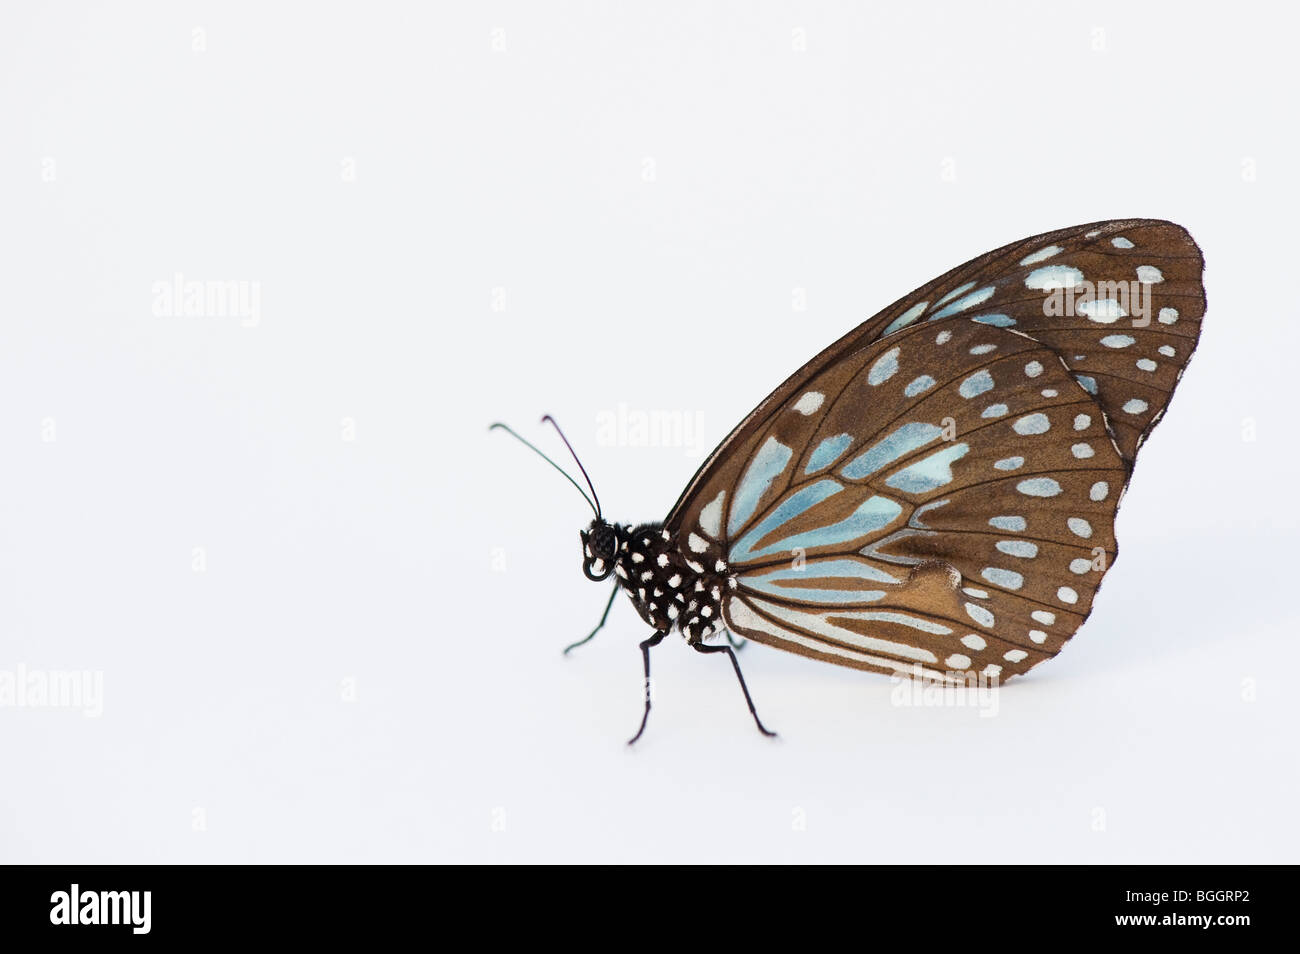 Tirumala limniace. Blue Butterfly Tiger su sfondo bianco Immagini Stock